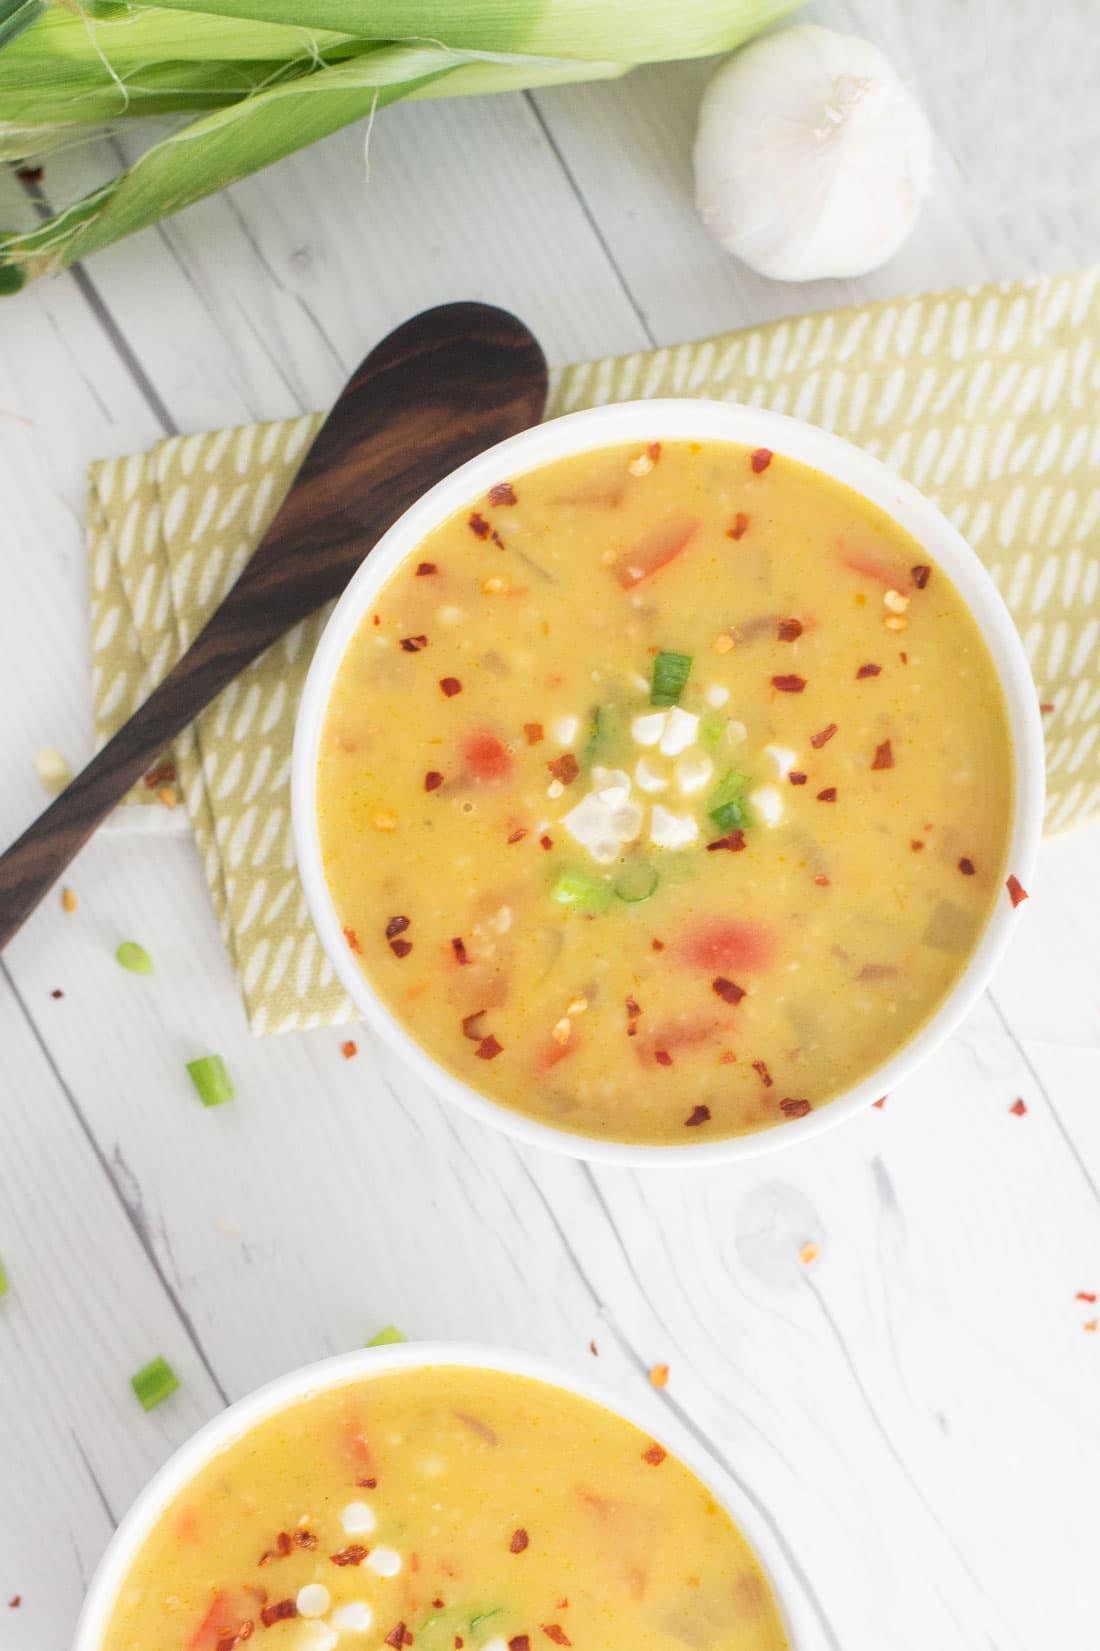 Corn Chowder Vegetarian  Easy Vegan Corn Chowder • Plant Based Food Blog Vegan